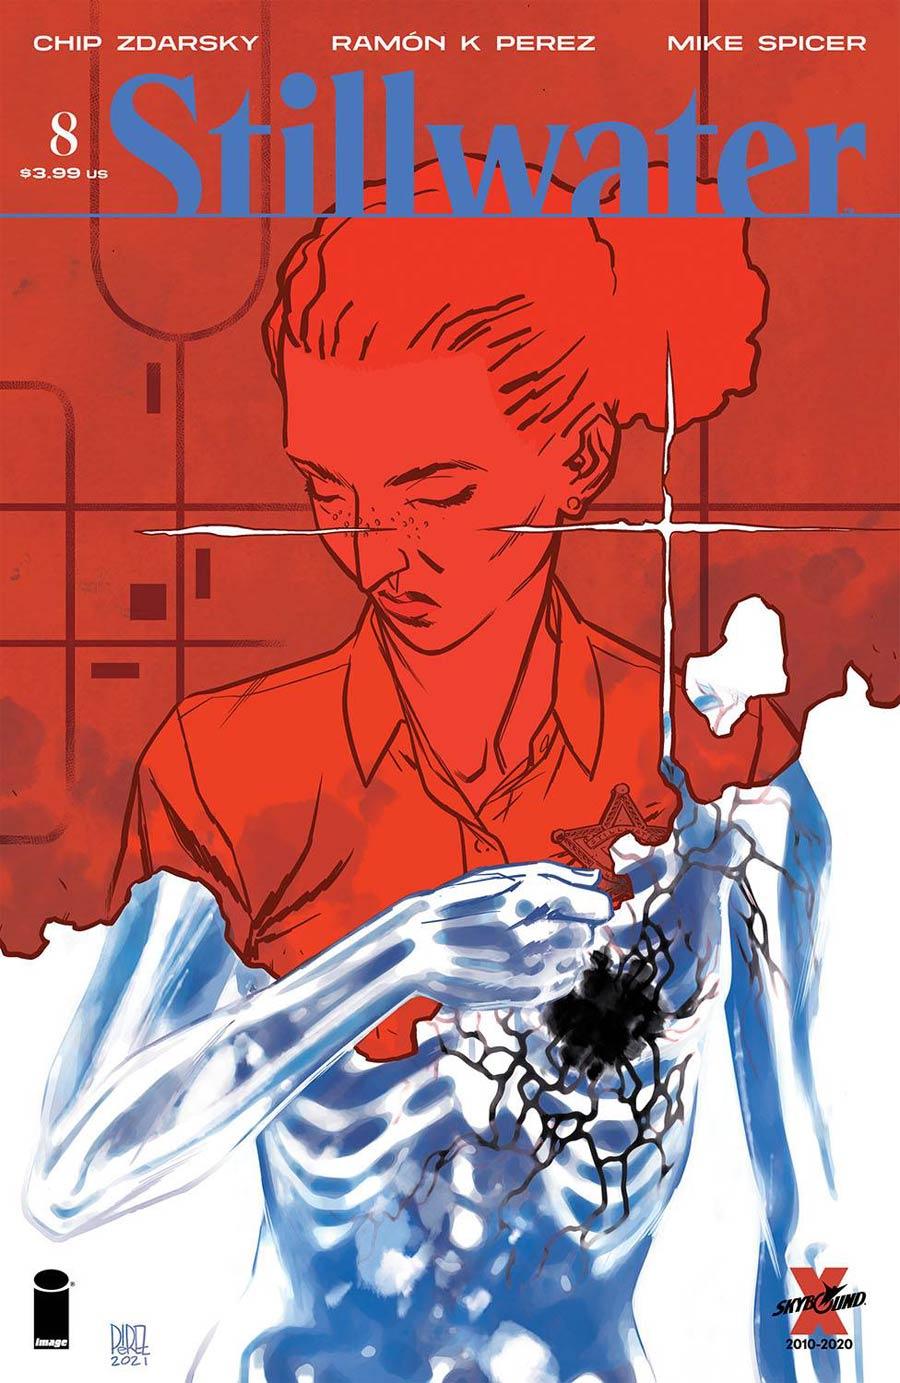 Stillwater By Zdarsky & Perez #8 Cover A Regular Ramon K Perez Cover